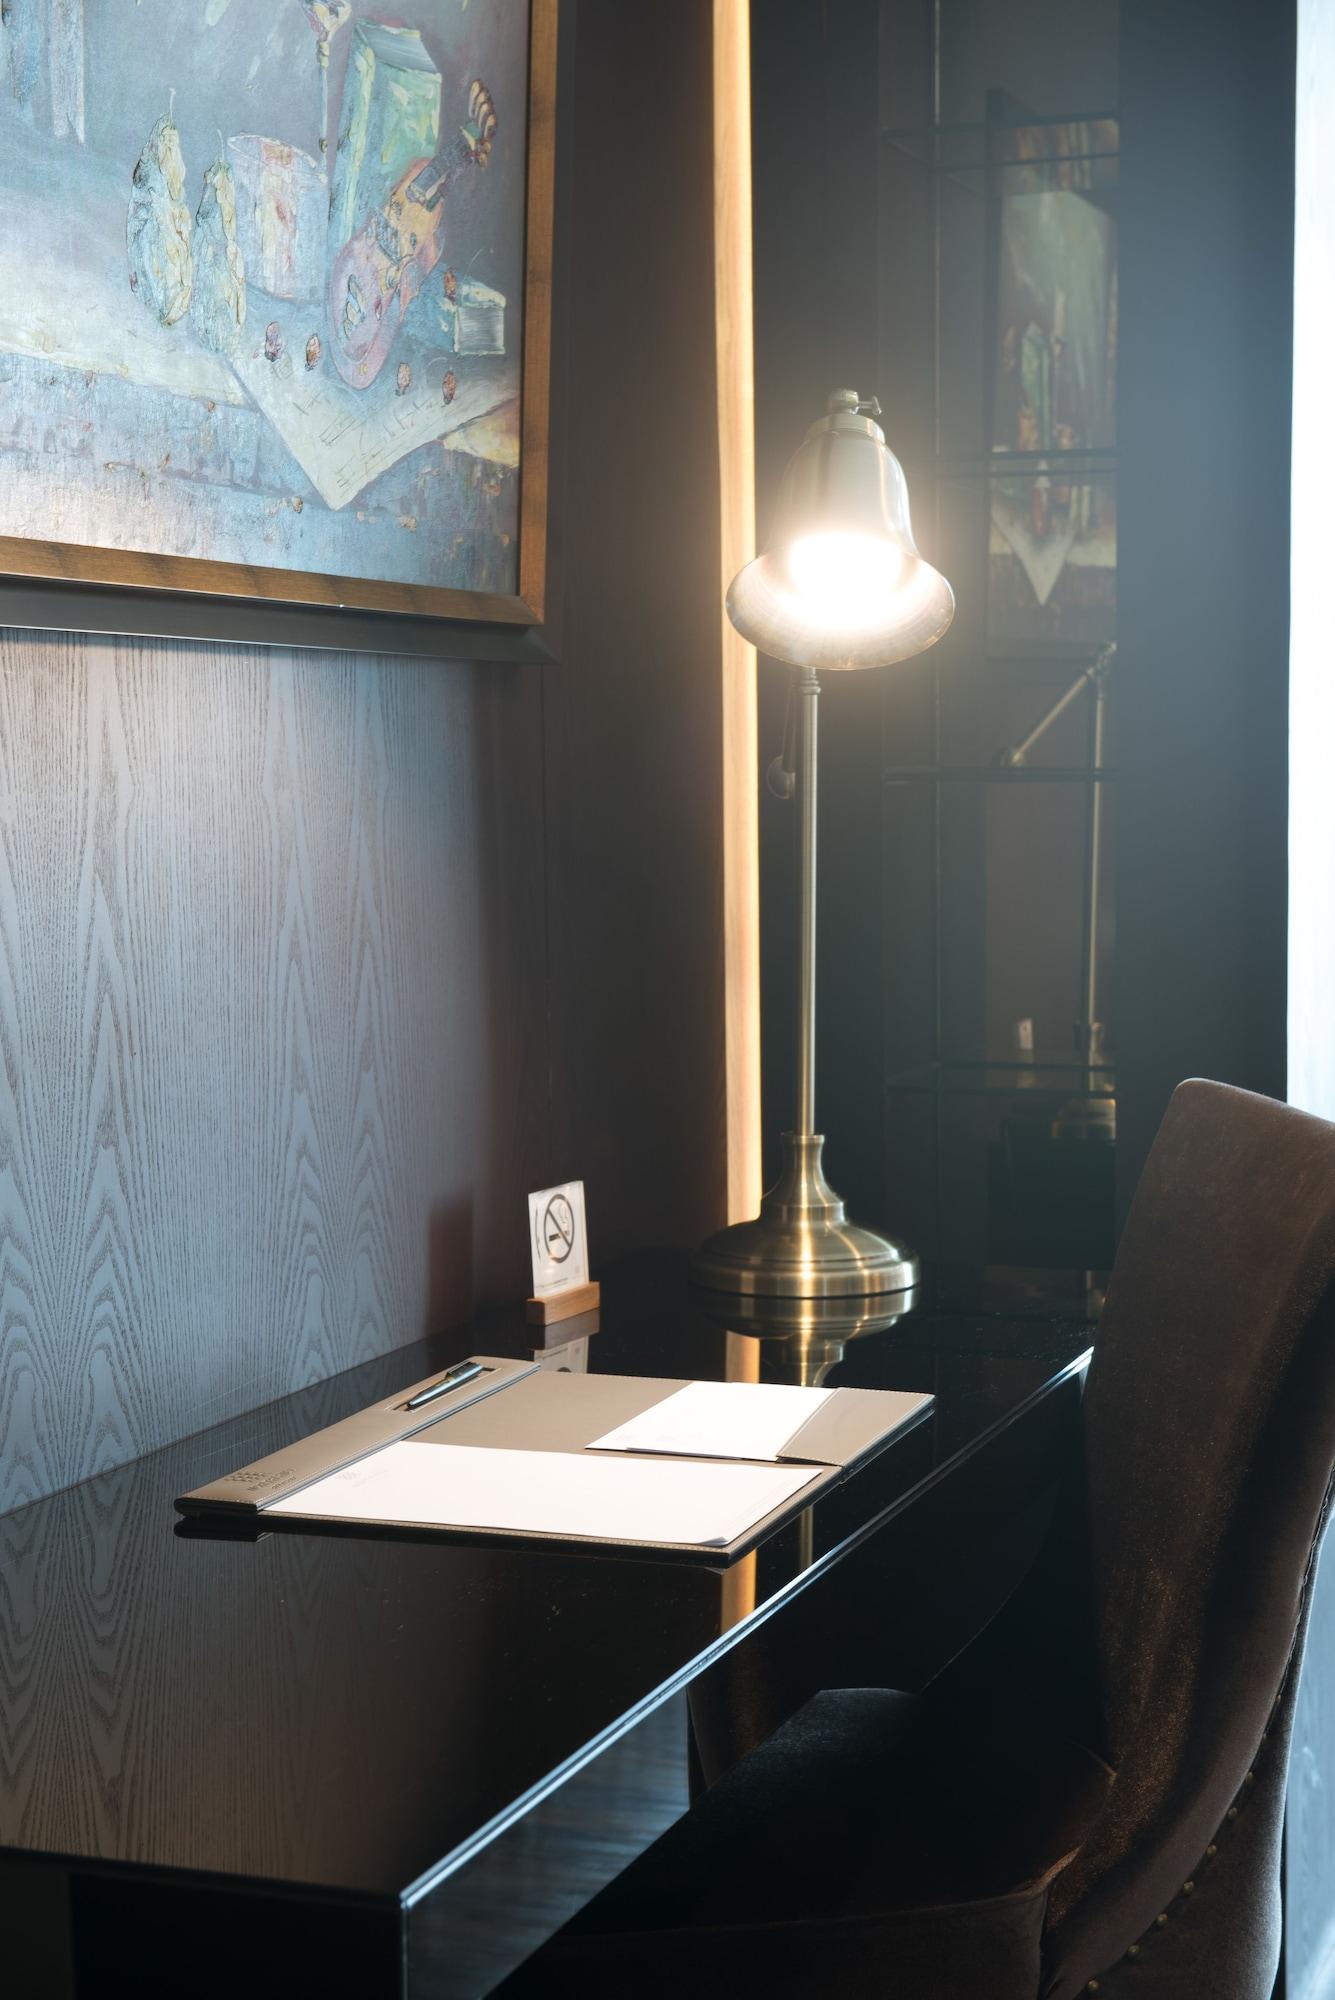 Fairway Luxury Suite